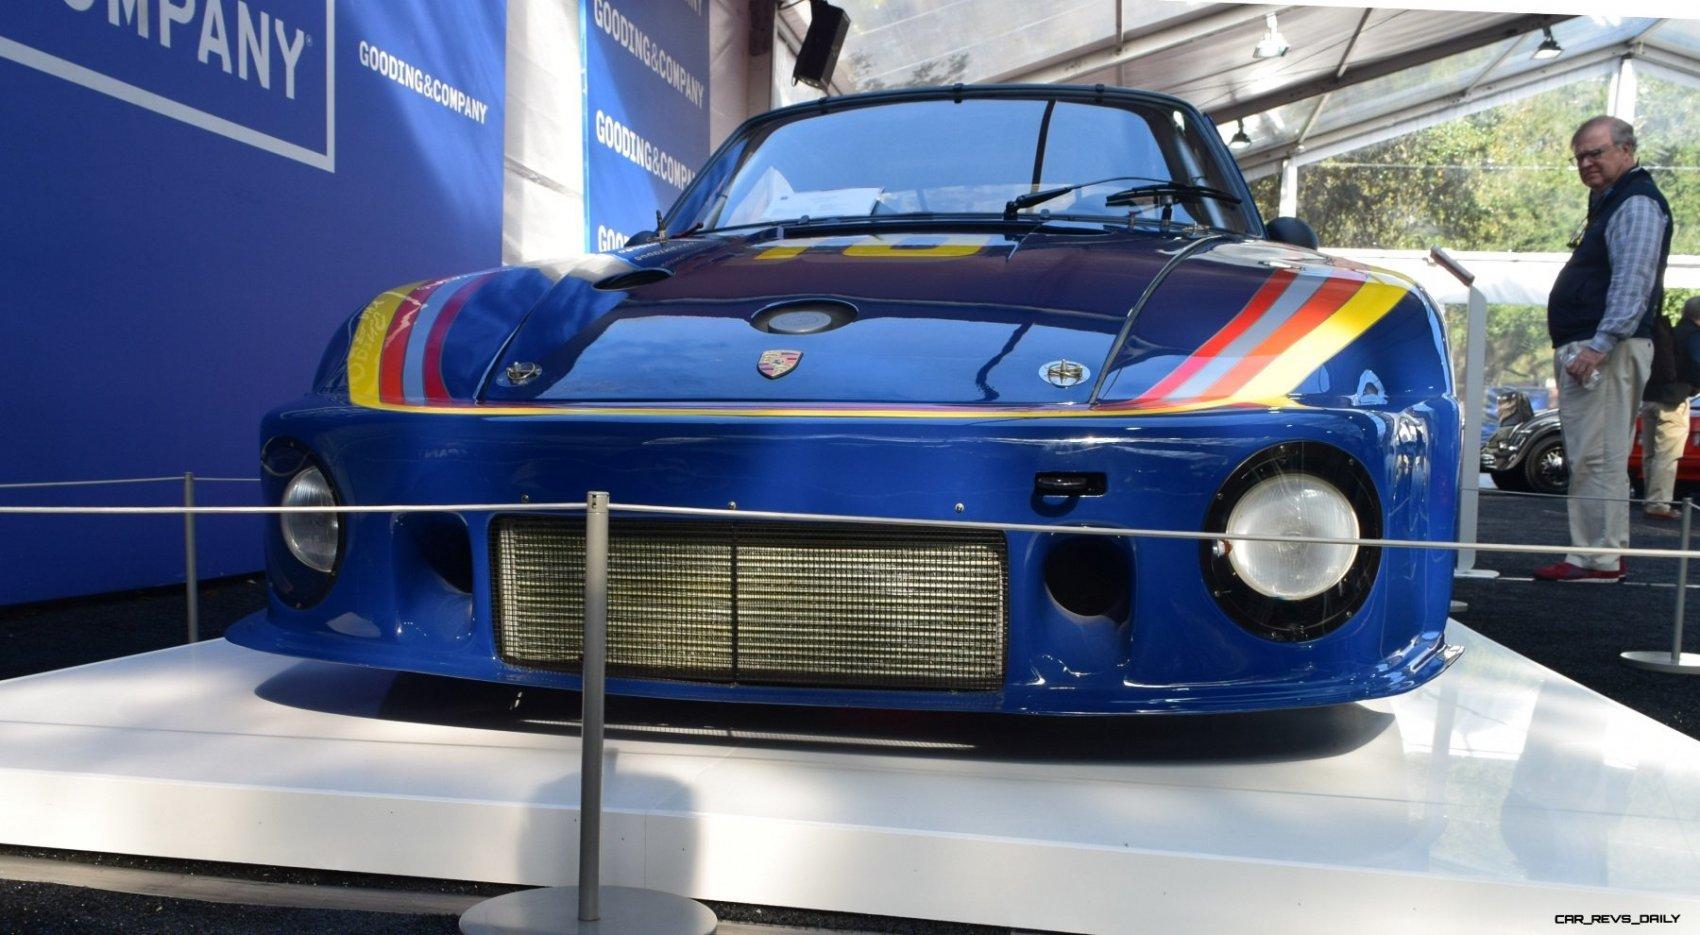 1979 Porsche 935 - Gooding Amelia 20197